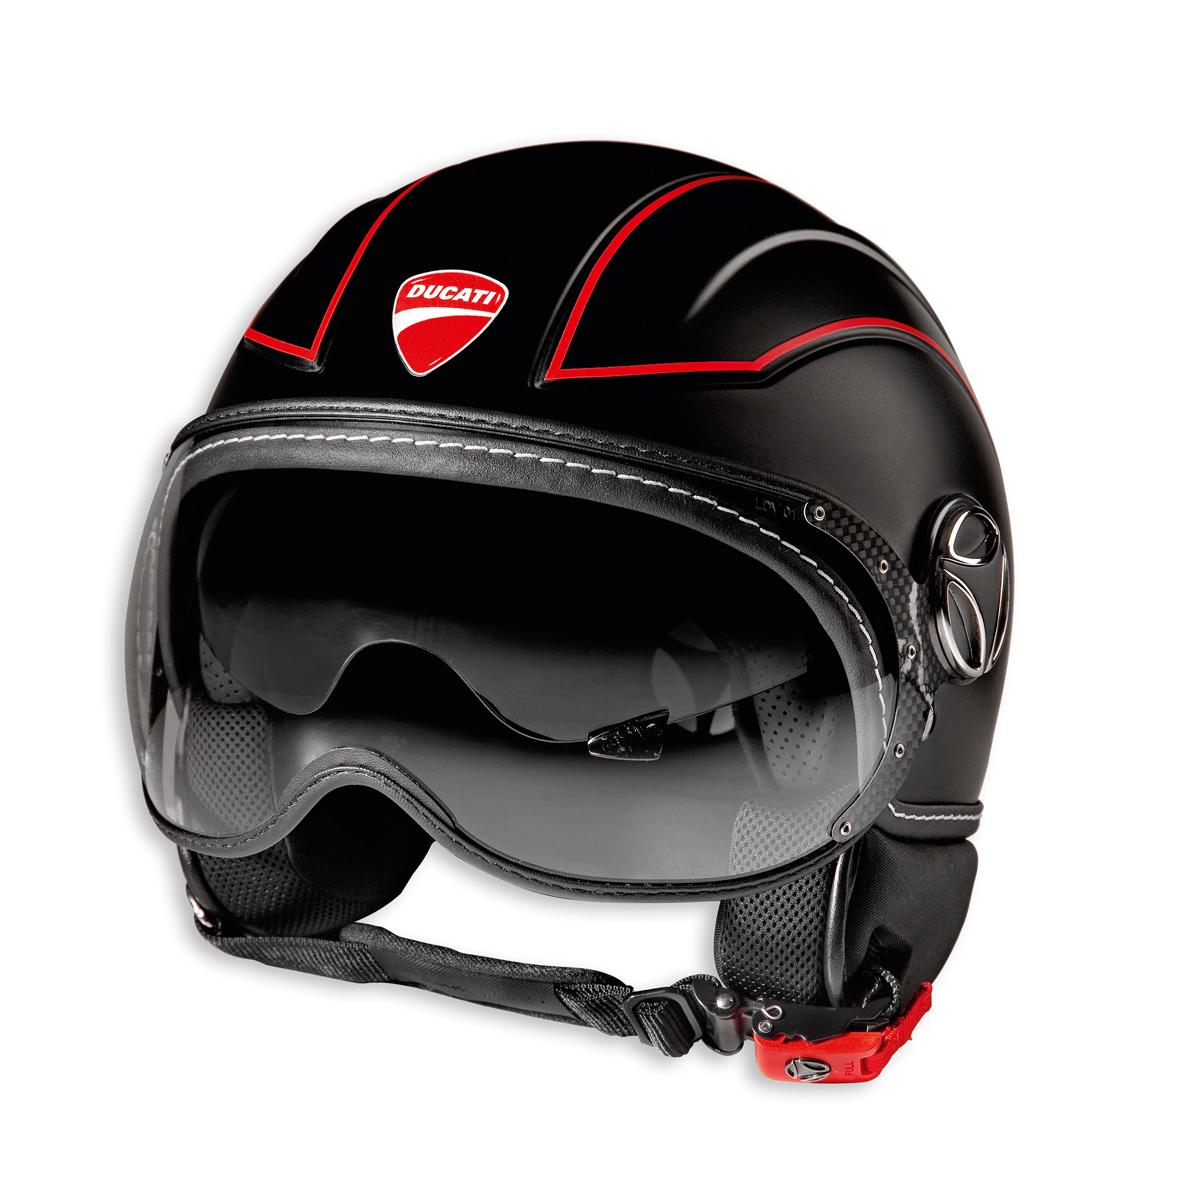 Ducati Jet-Set Helmet by Momo Design